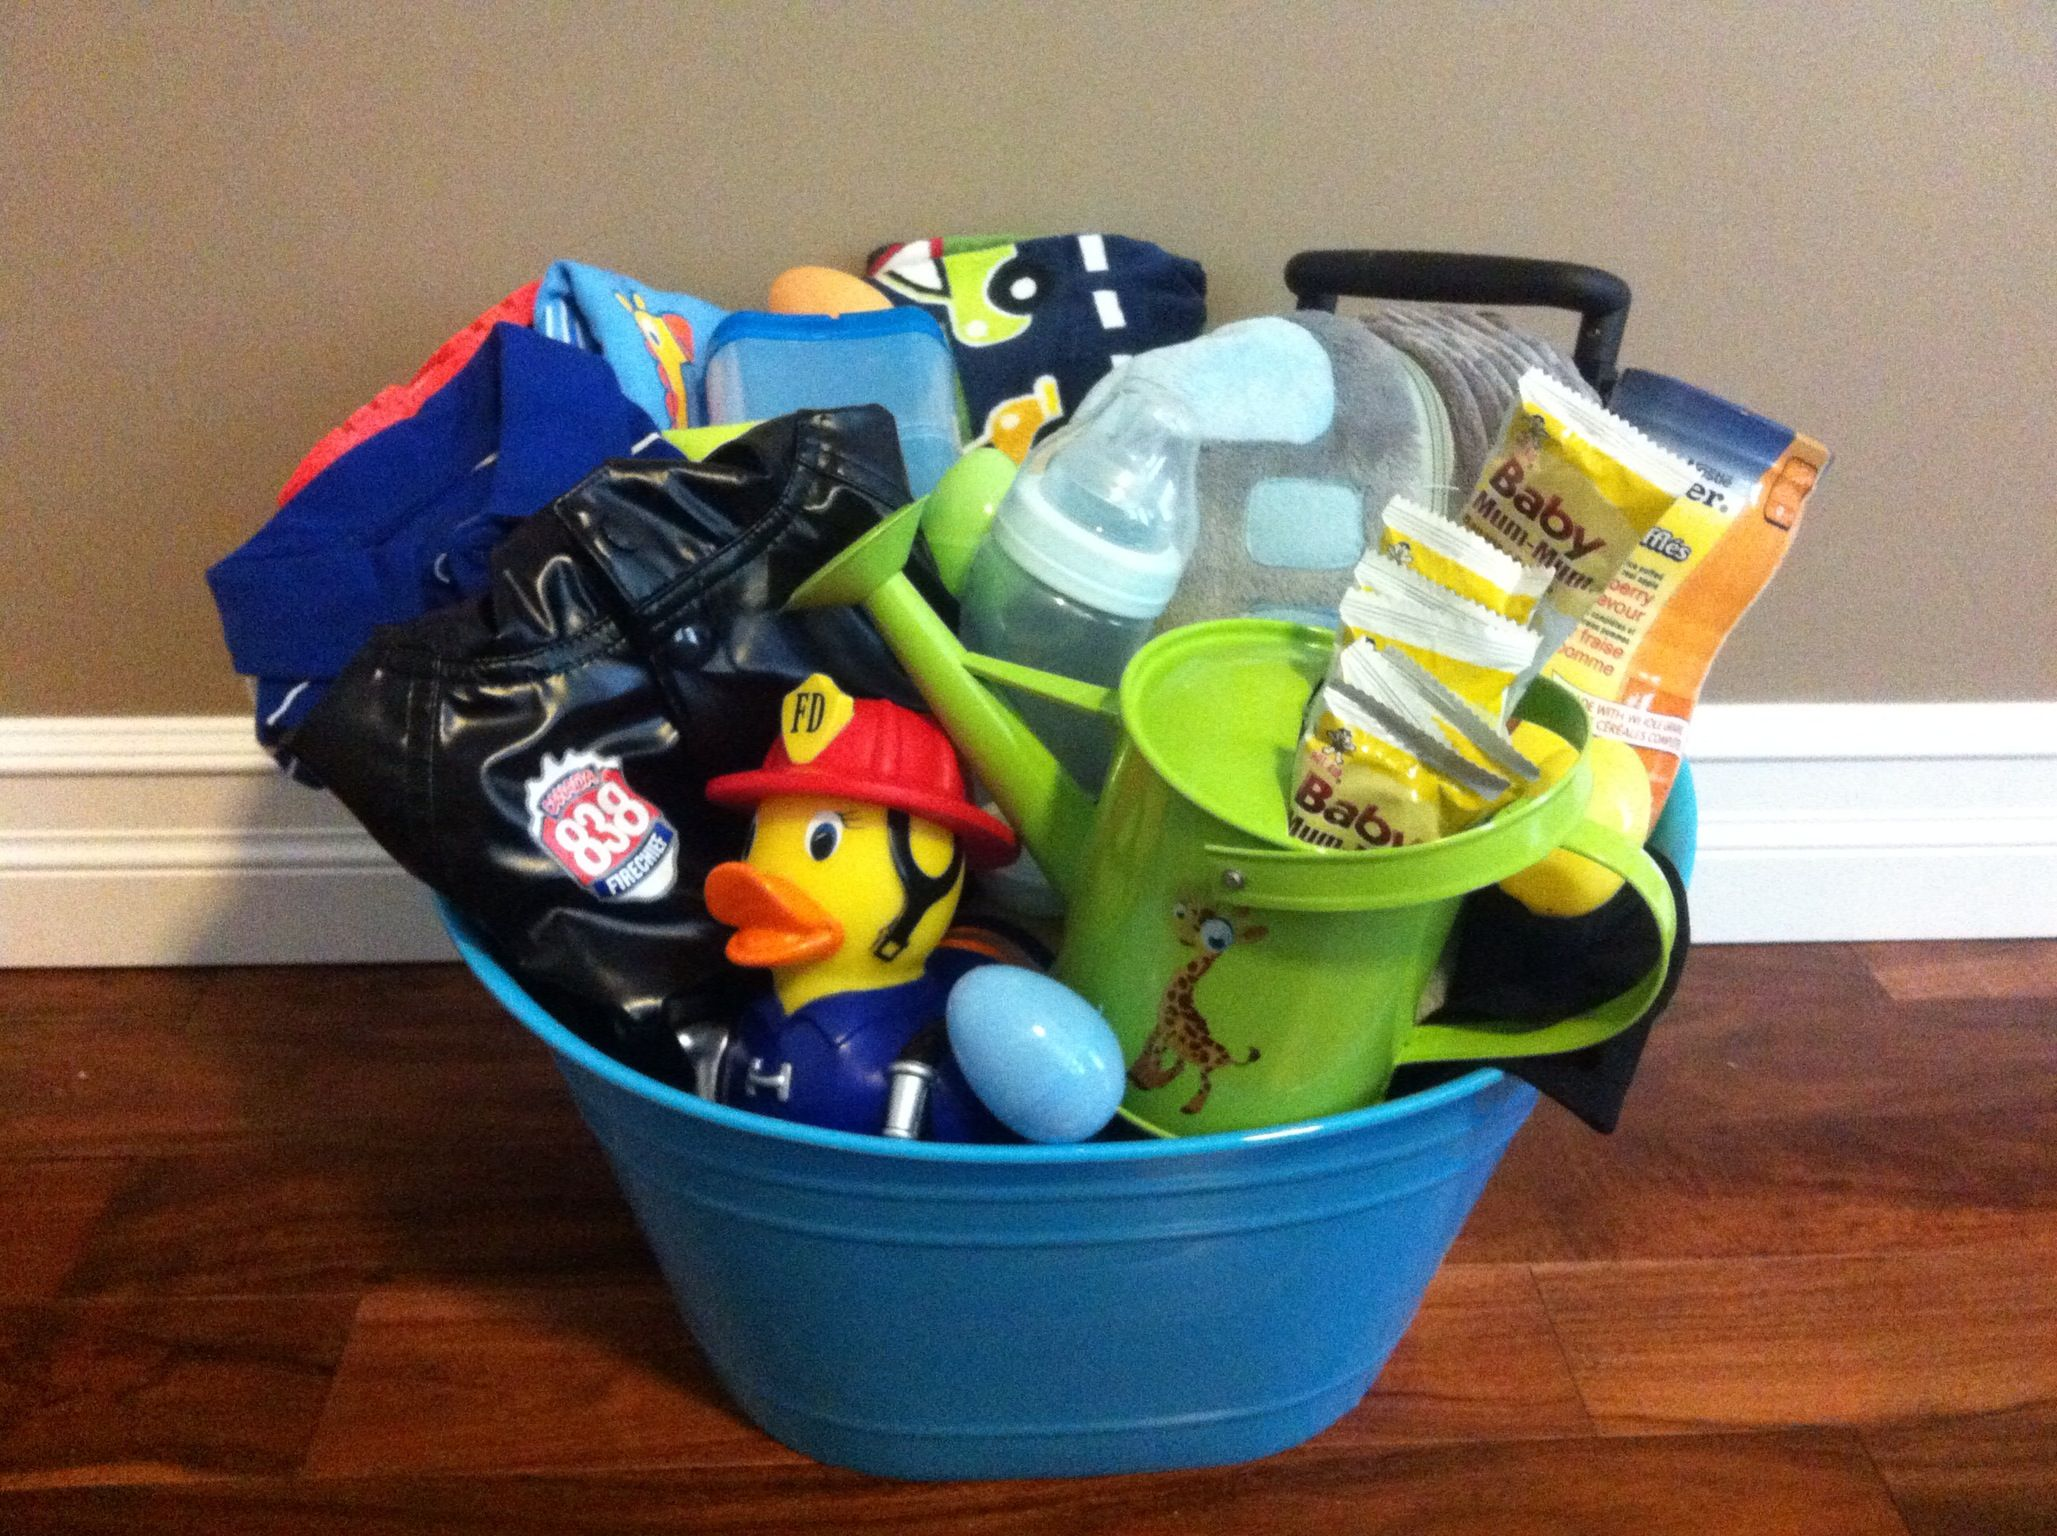 Easter Basket For My 9 Month Old Son Basket Is Filled